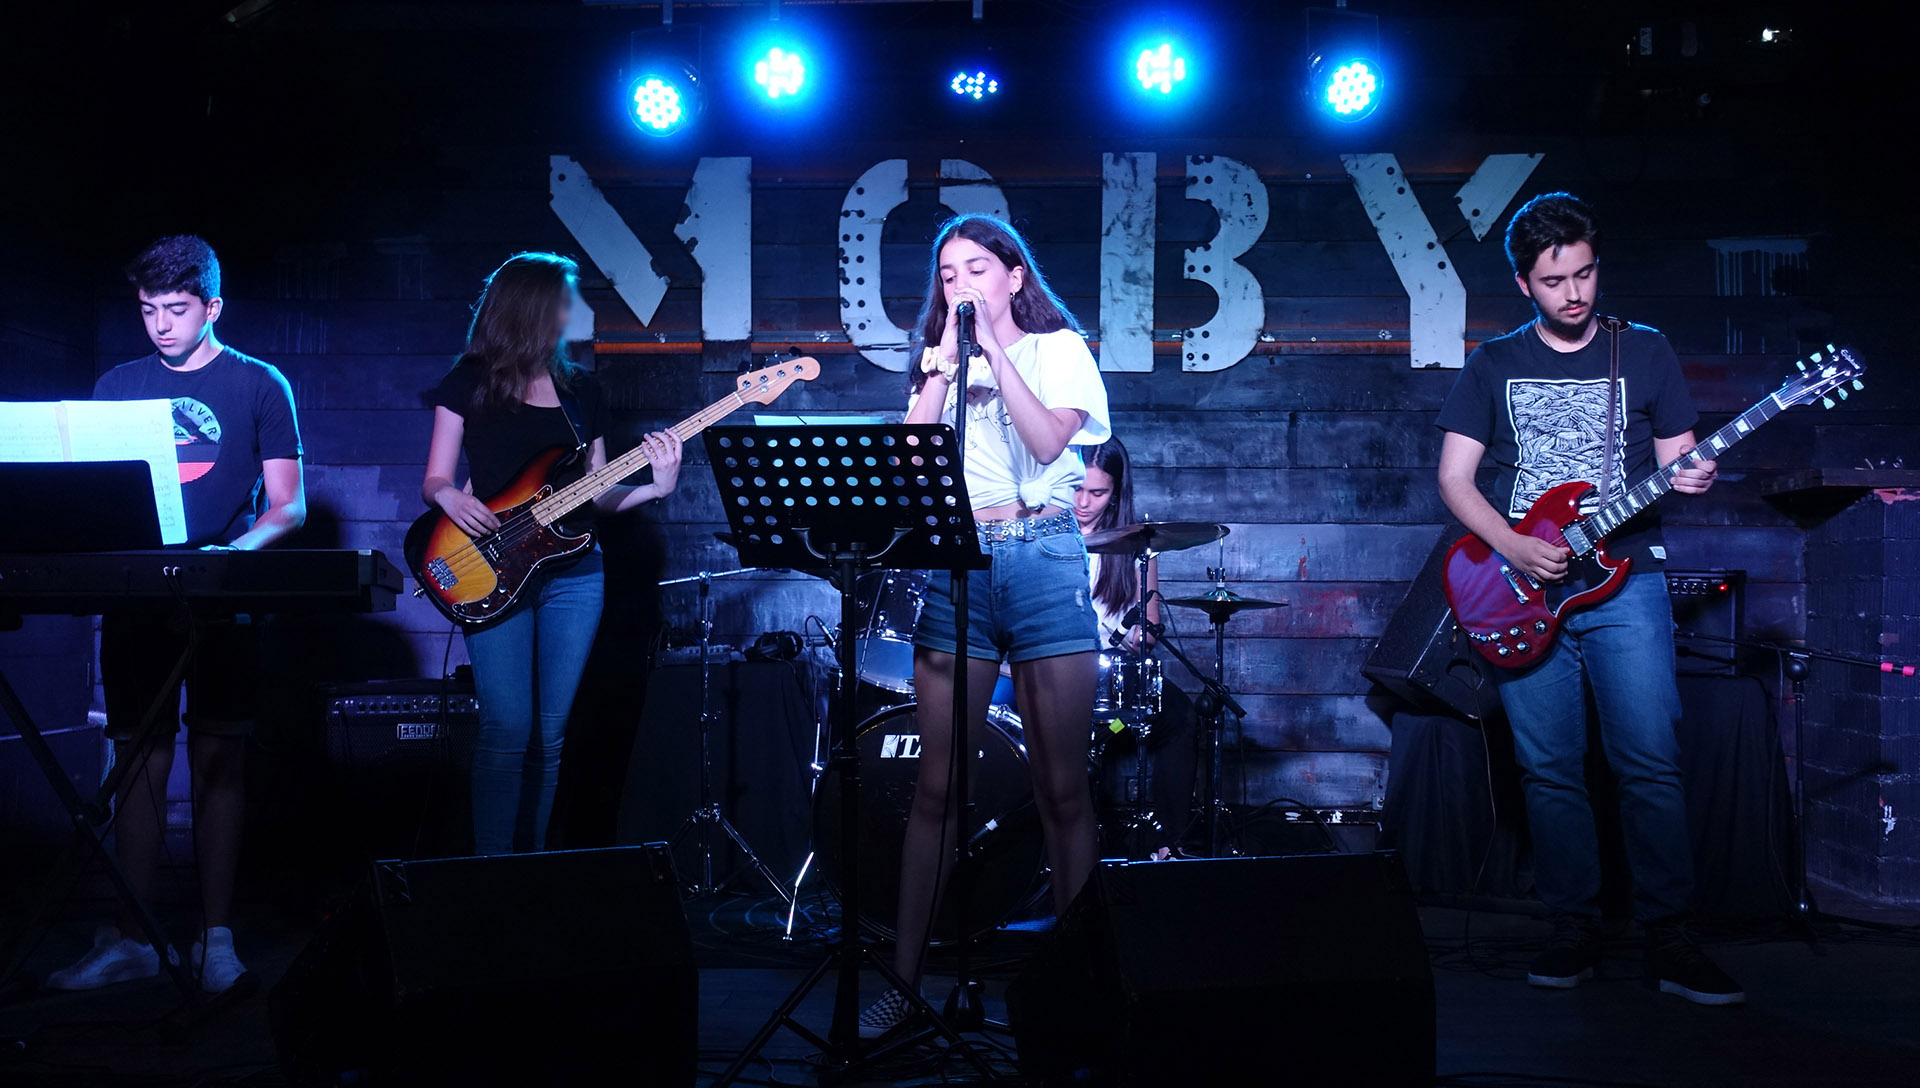 grupo de pop-rock tocando en sala moby dick